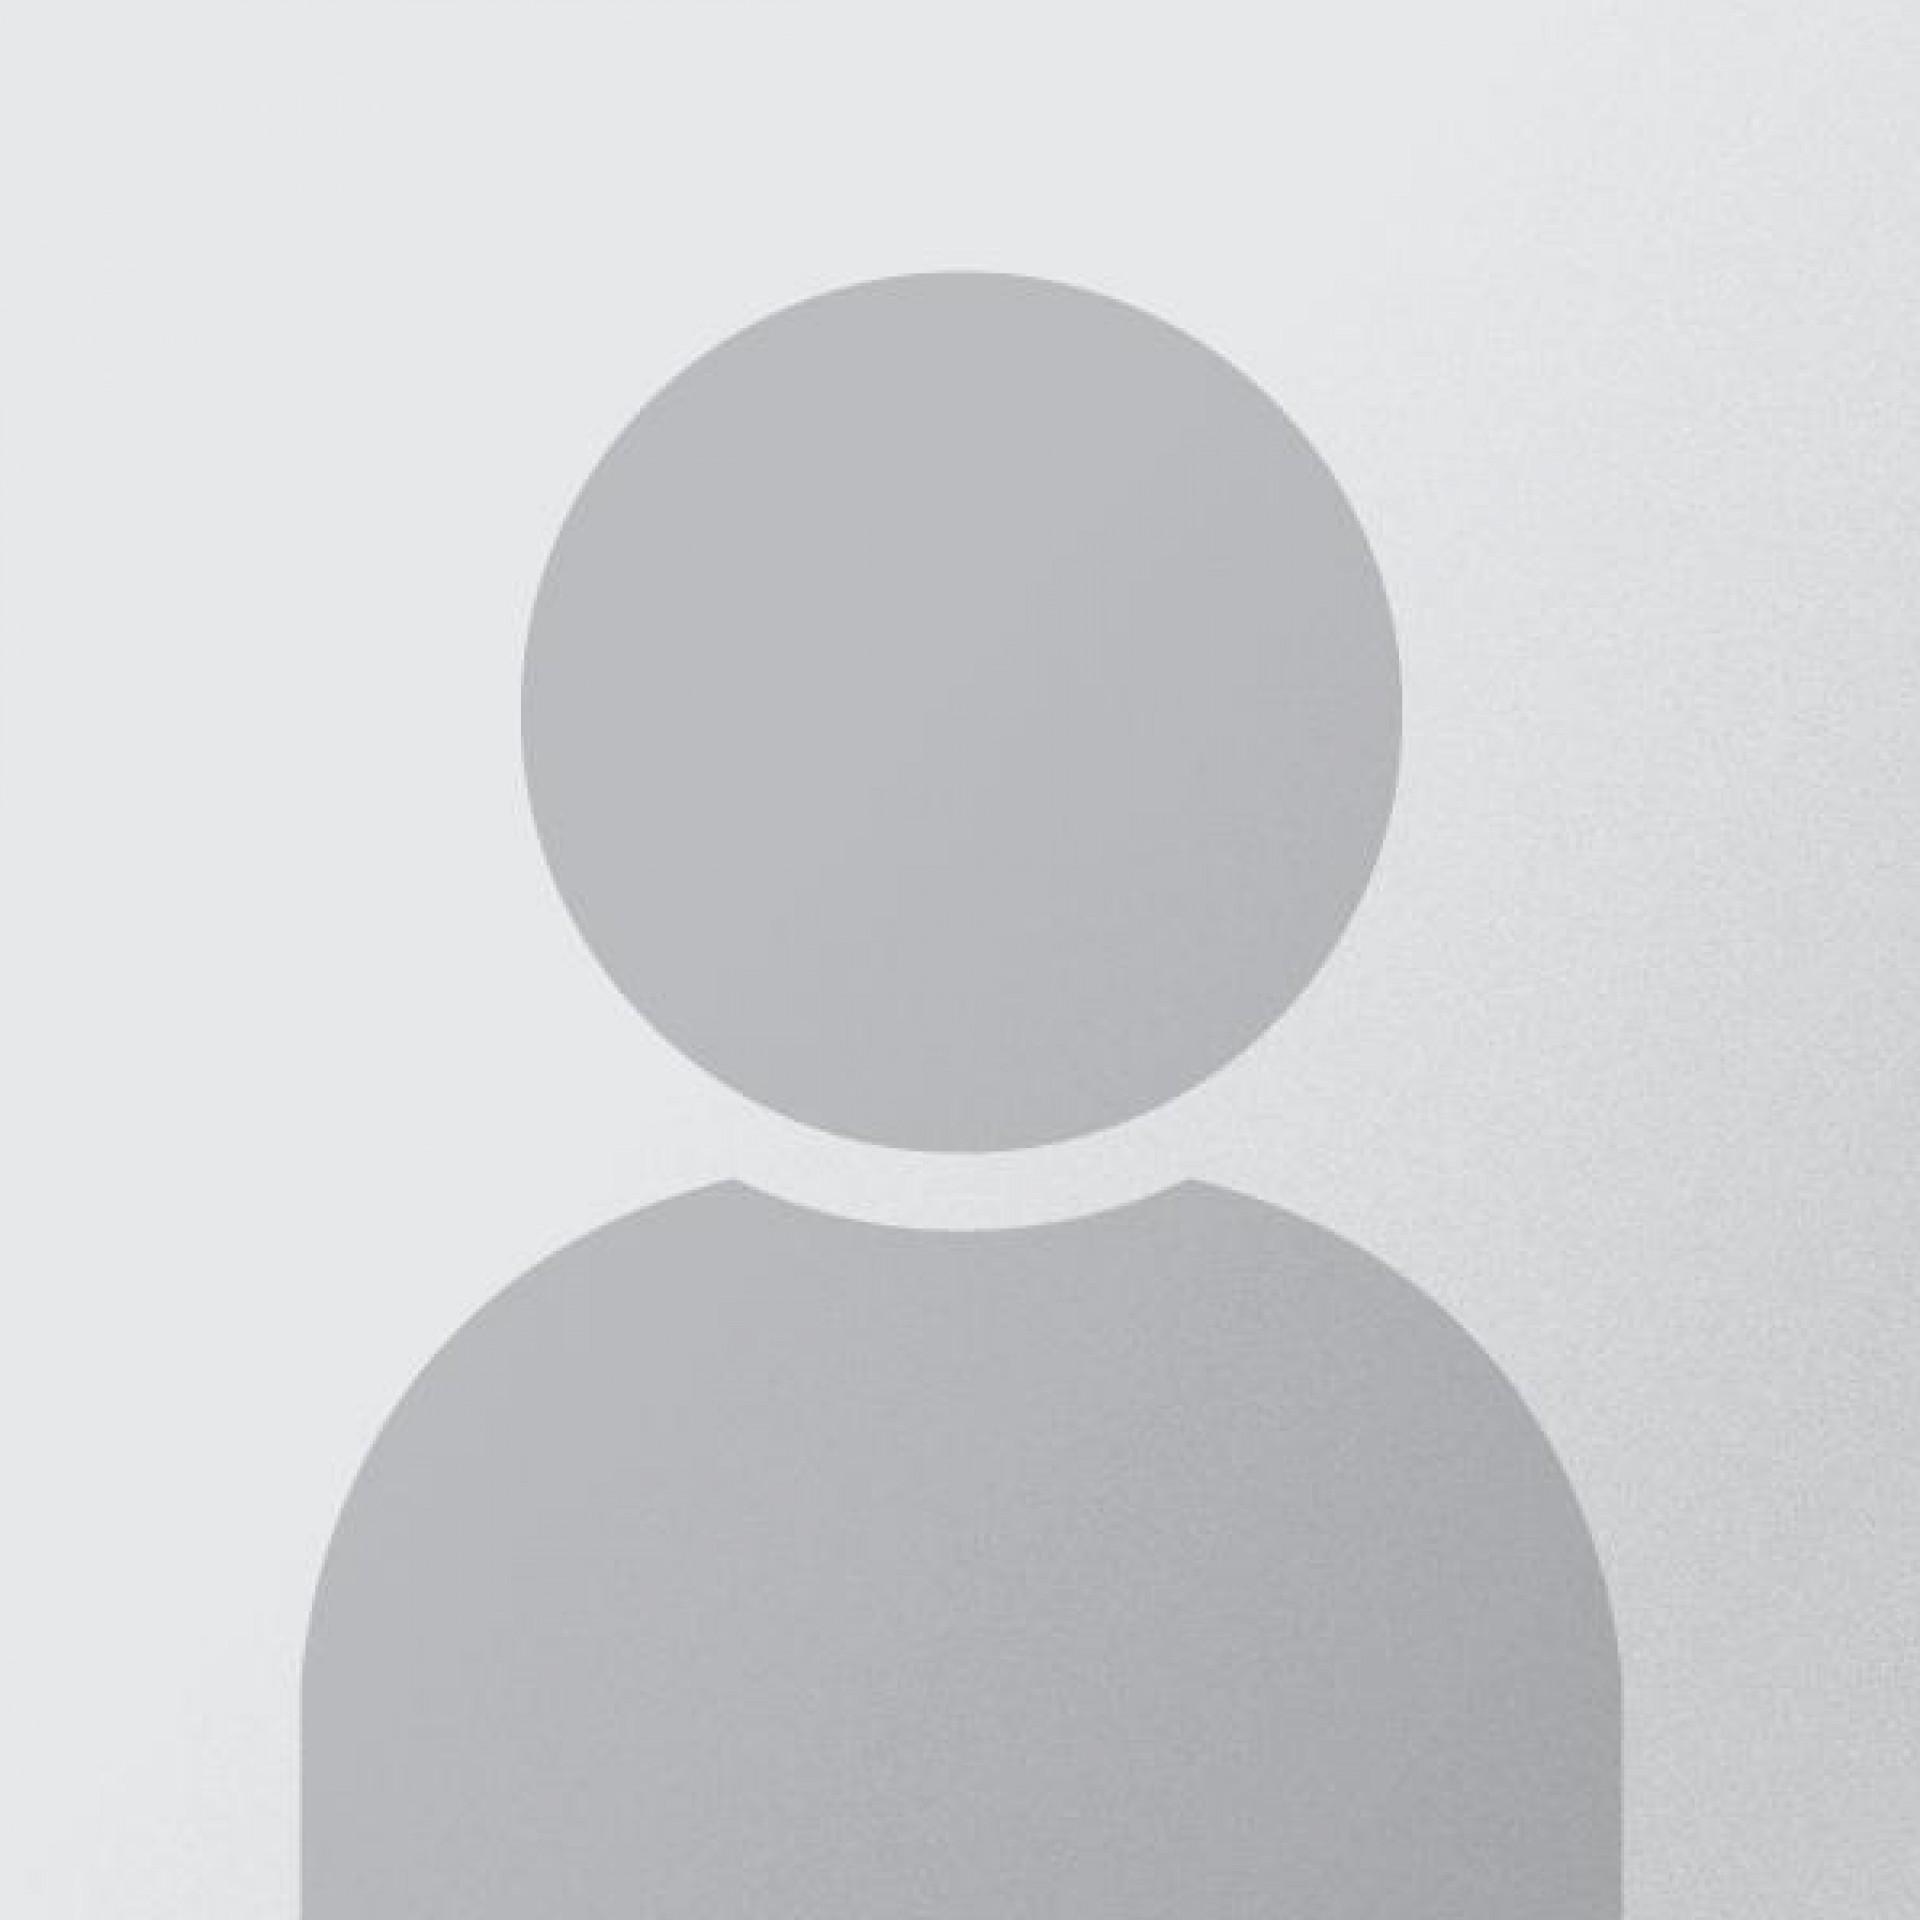 fotografia p021 profilu 01022FZ1KH